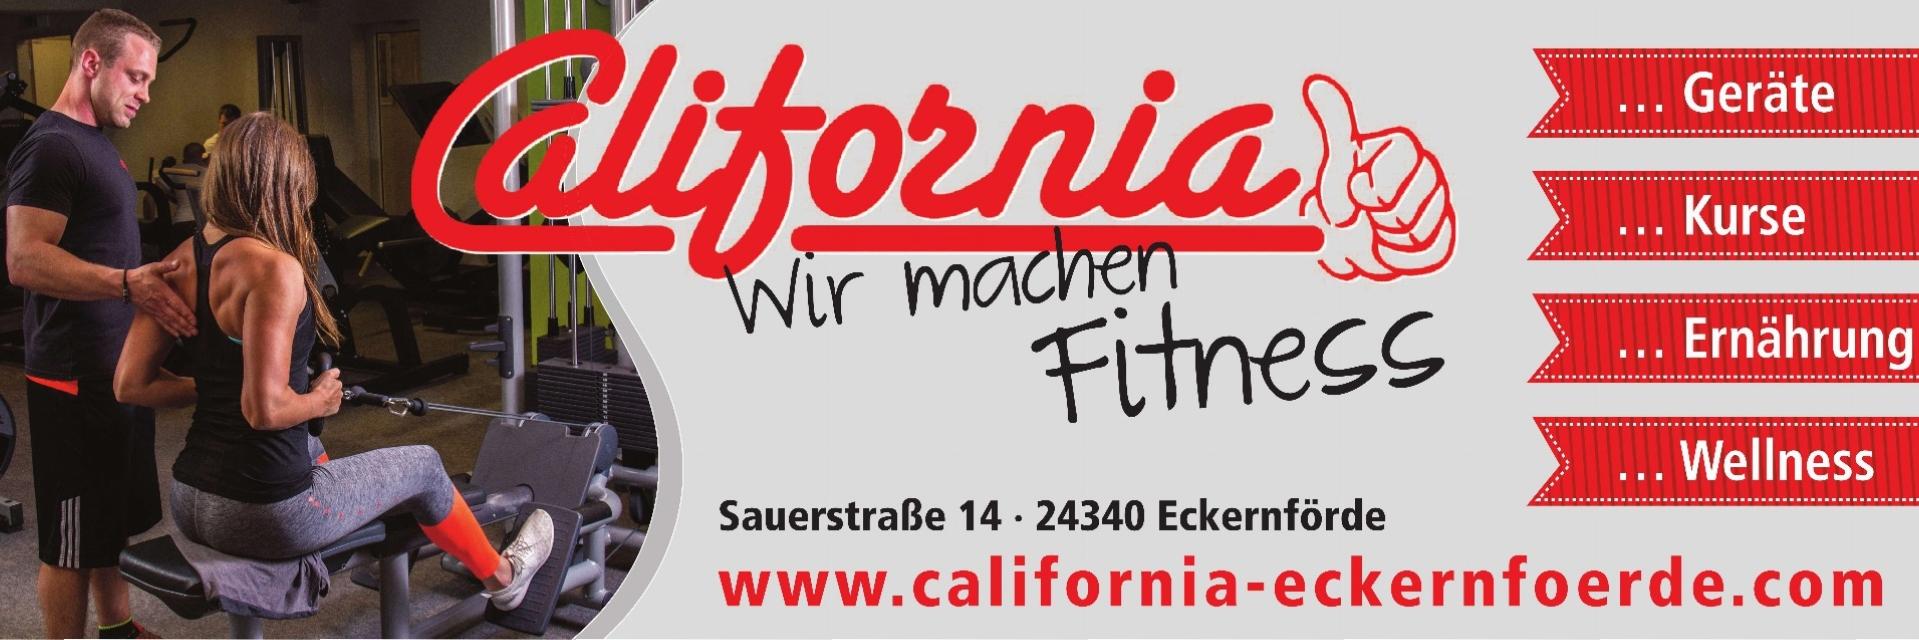 http://california-eckernfoerde.com/